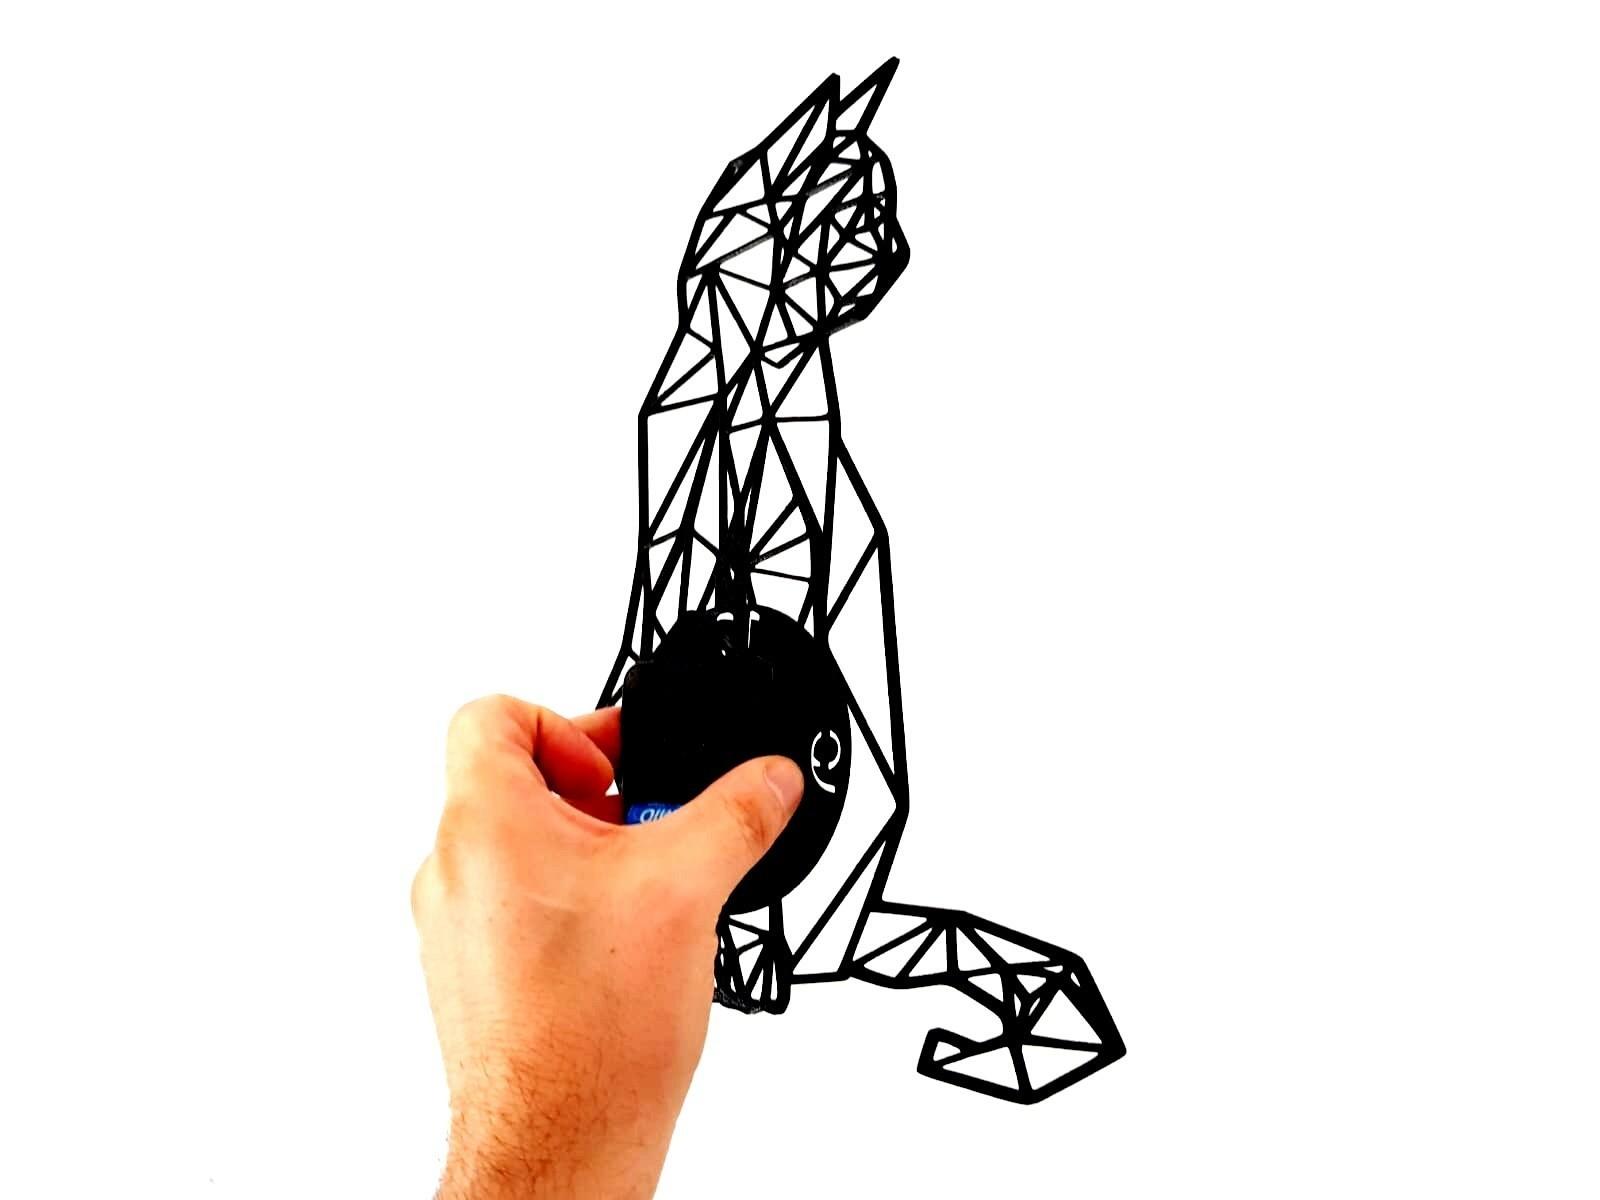 photostudio_1534446616282.jpg Download STL file Clock geometric cat • 3D printing design, 3dlito